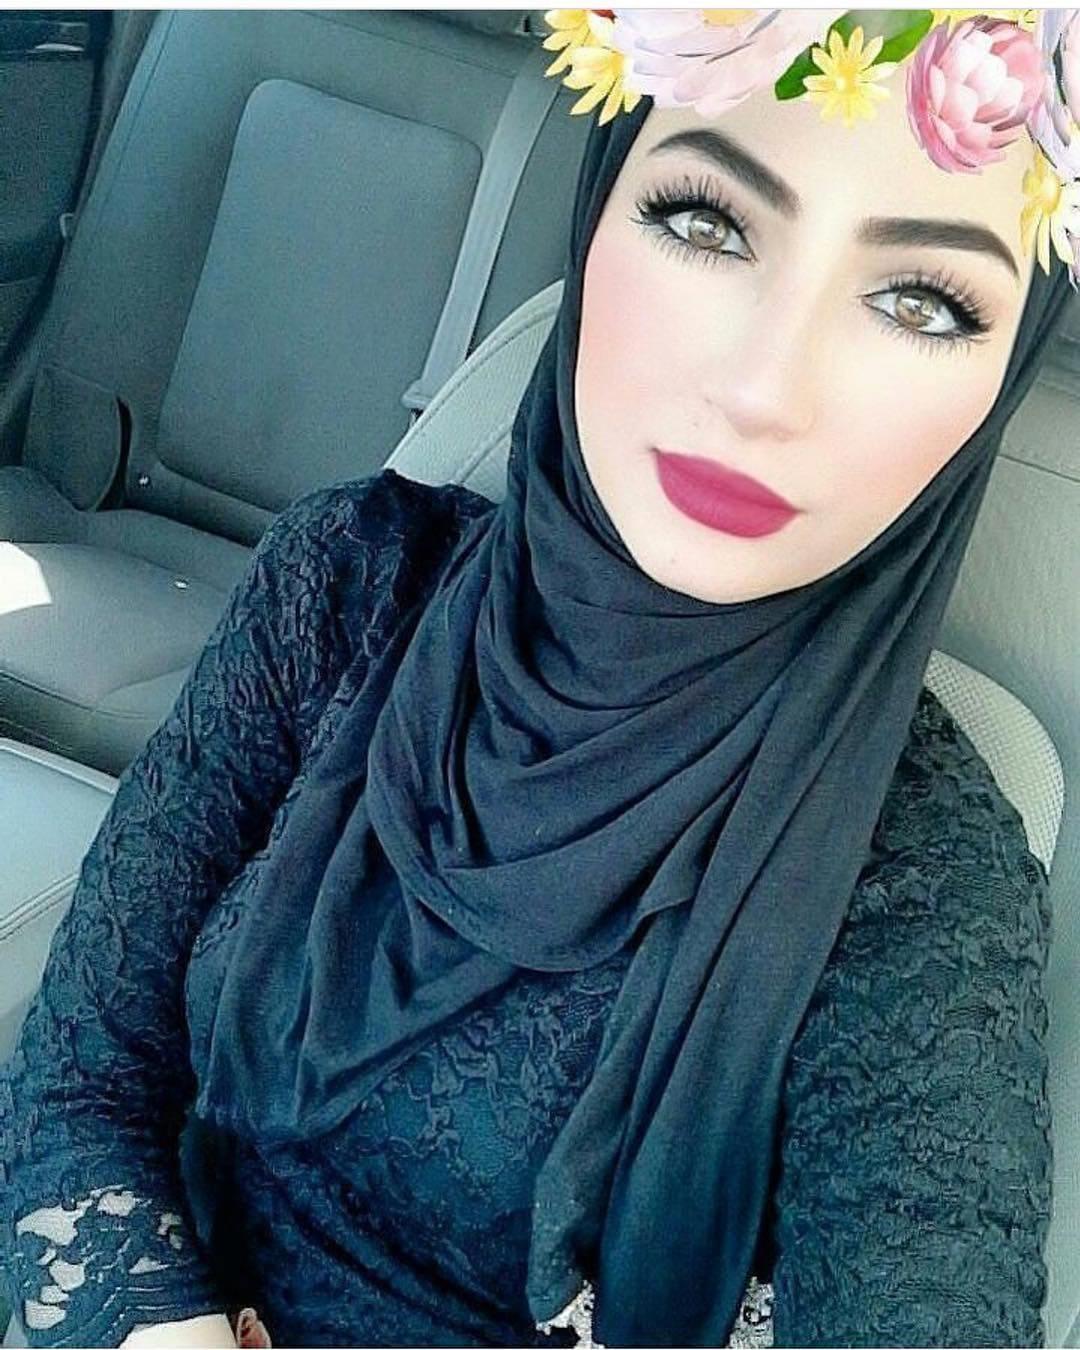 صور بنات مصر , اجمل بنات مصرية